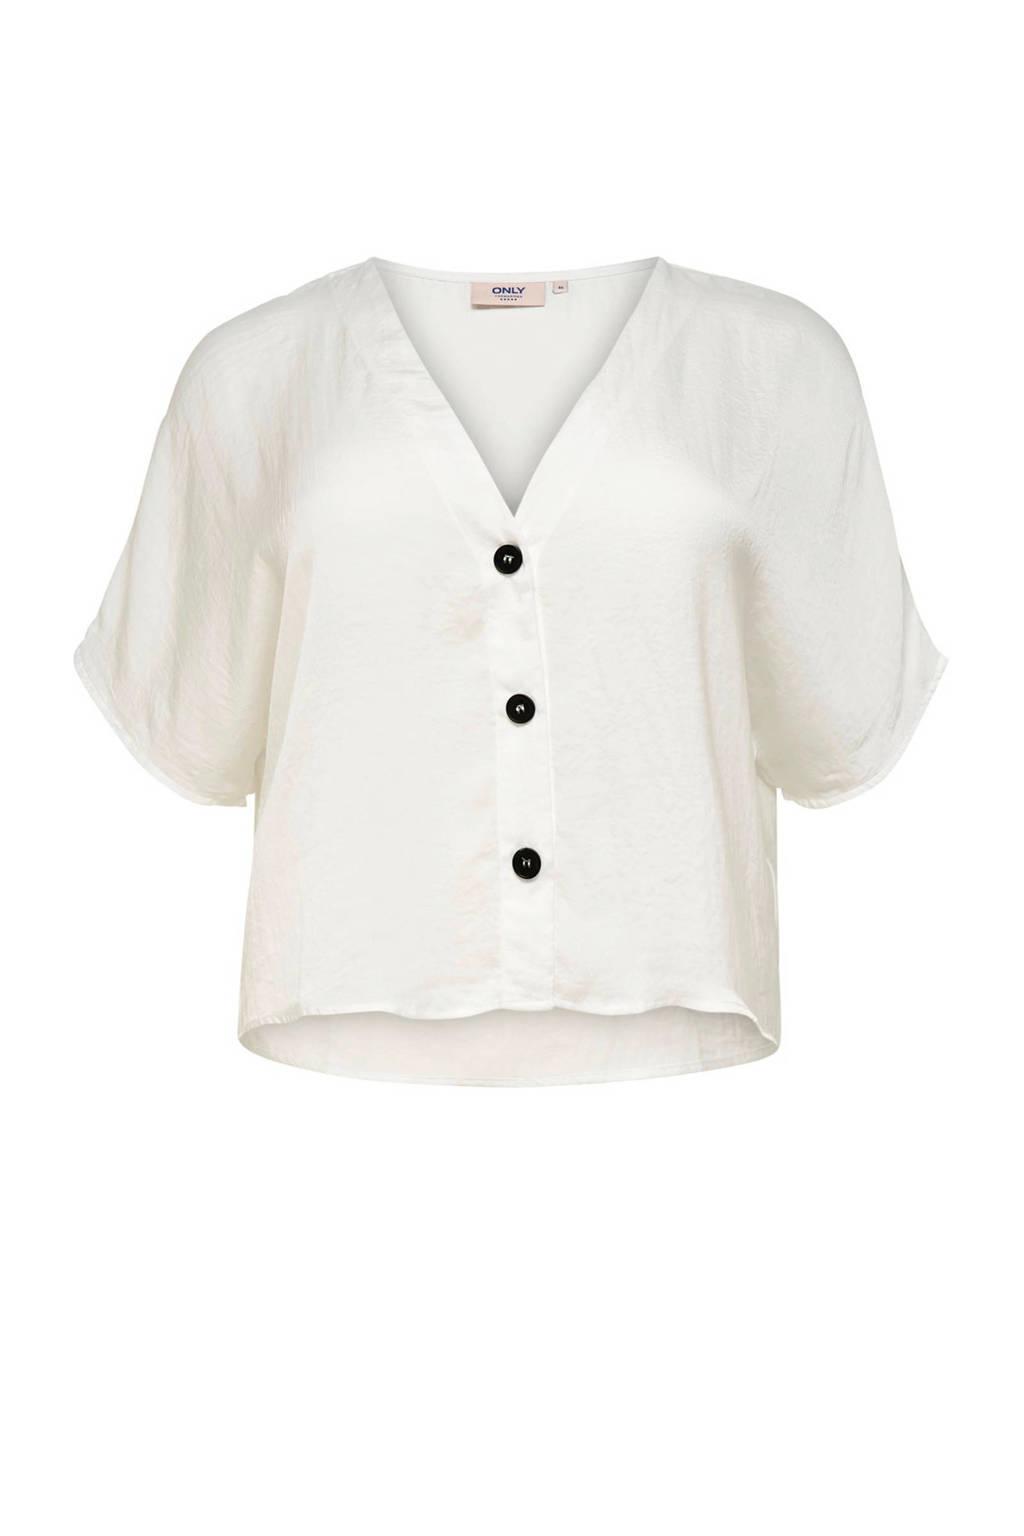 ONLY carmakoma blouse ecru, Ecru